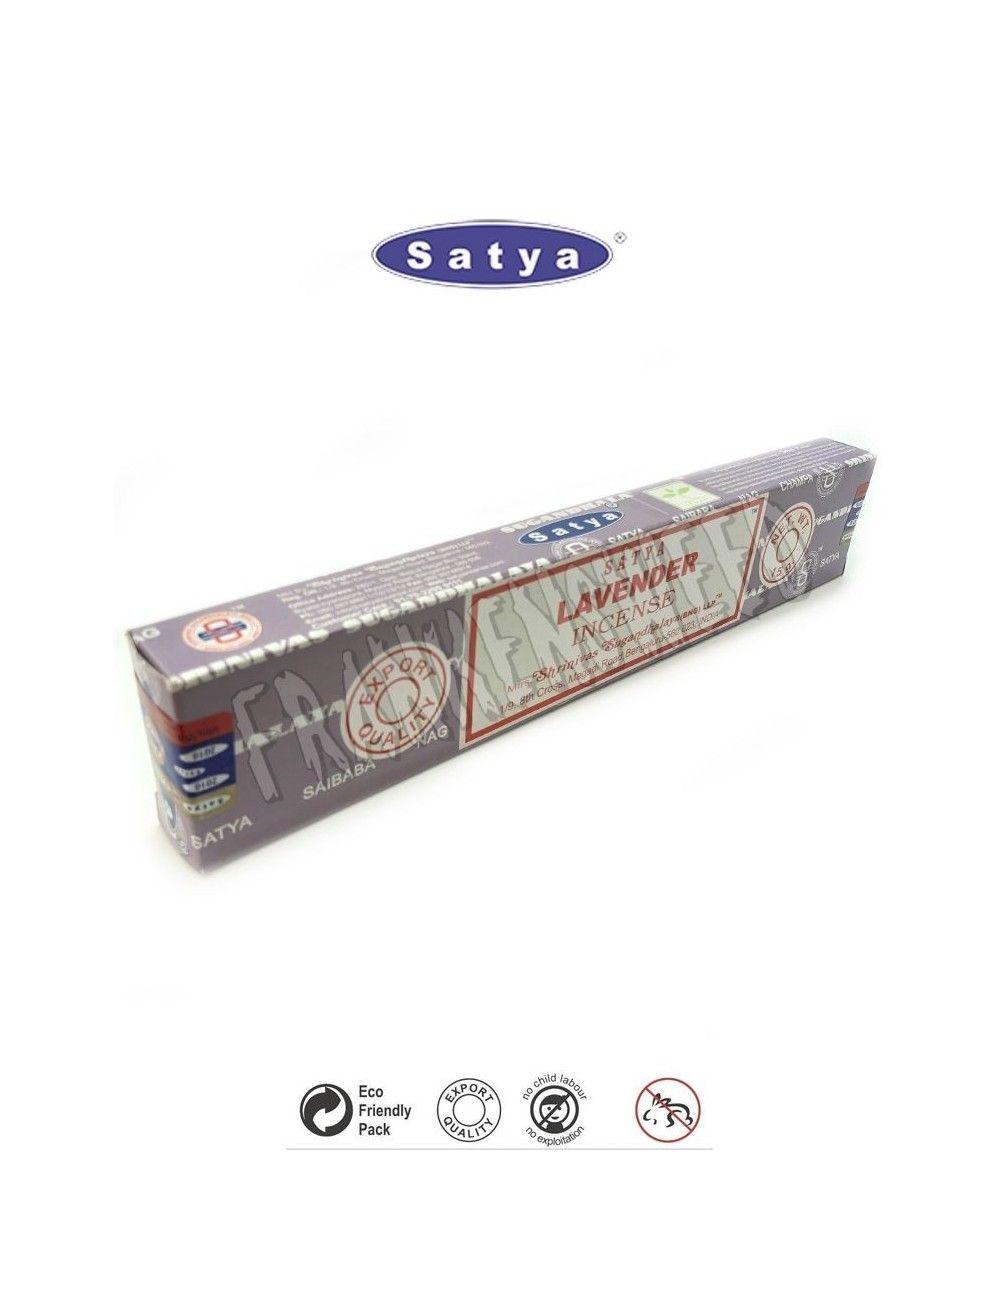 Lavender - Satya Sai Baba - Incense Sticks